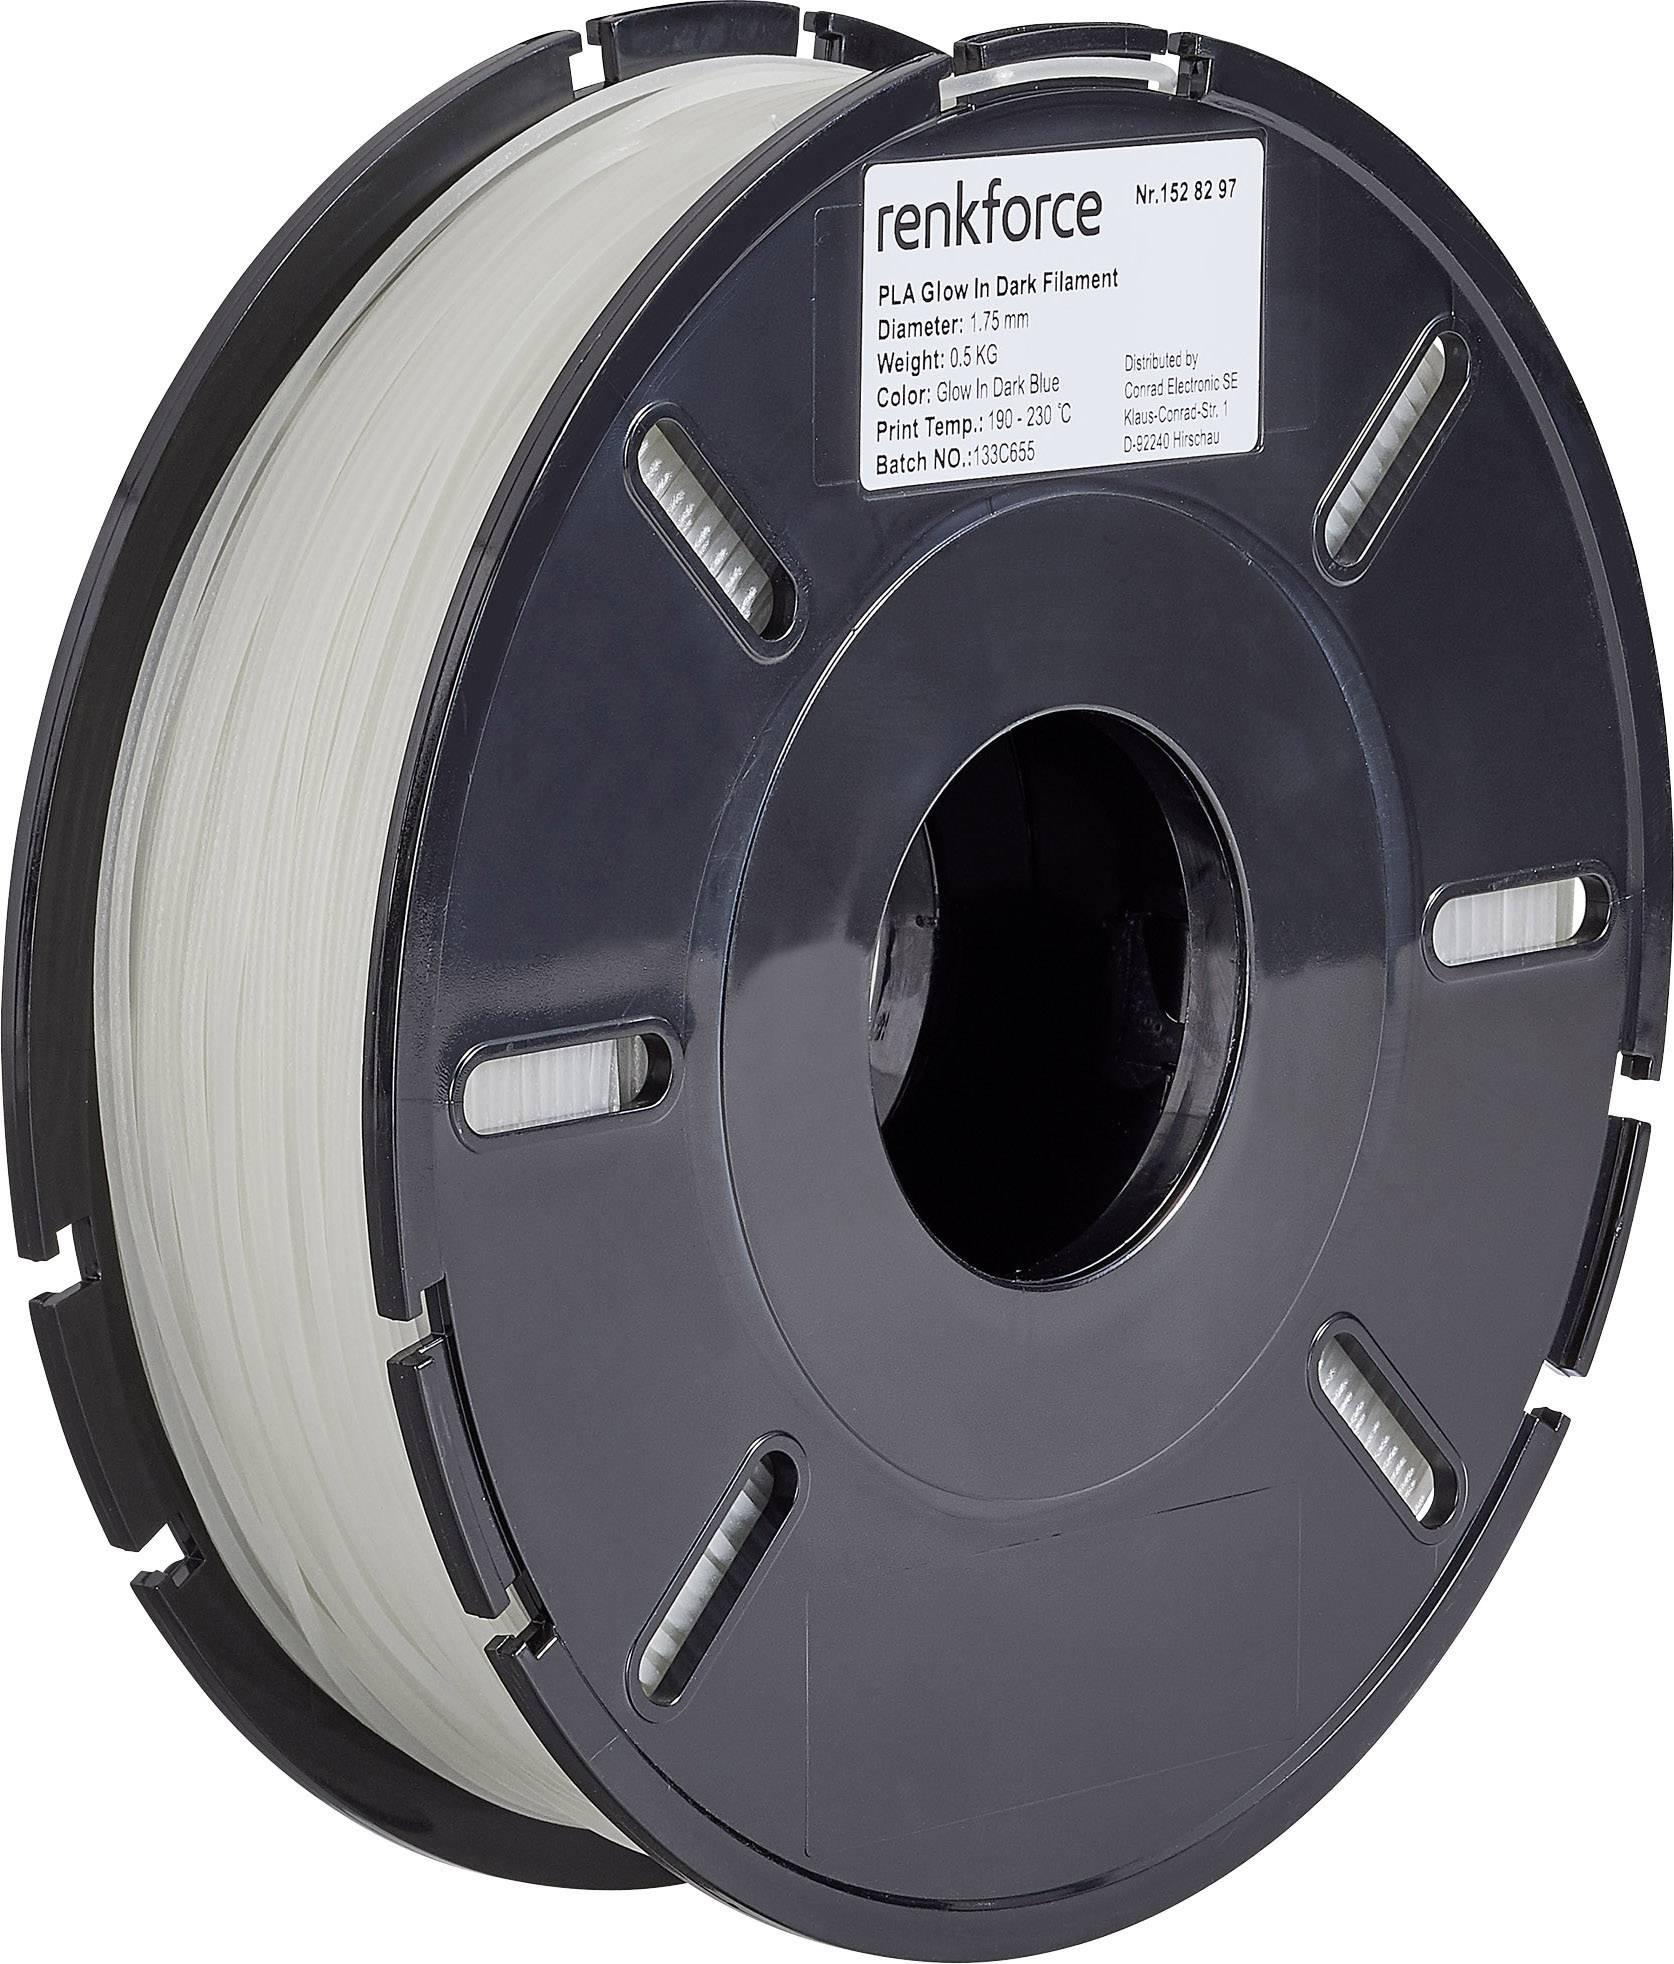 Vlákno pre 3Dtlačiarne, Renkforce 01.04.01.5122, PLA plast , 1.75 mm, 500 g, modrá (fluorescenčná)